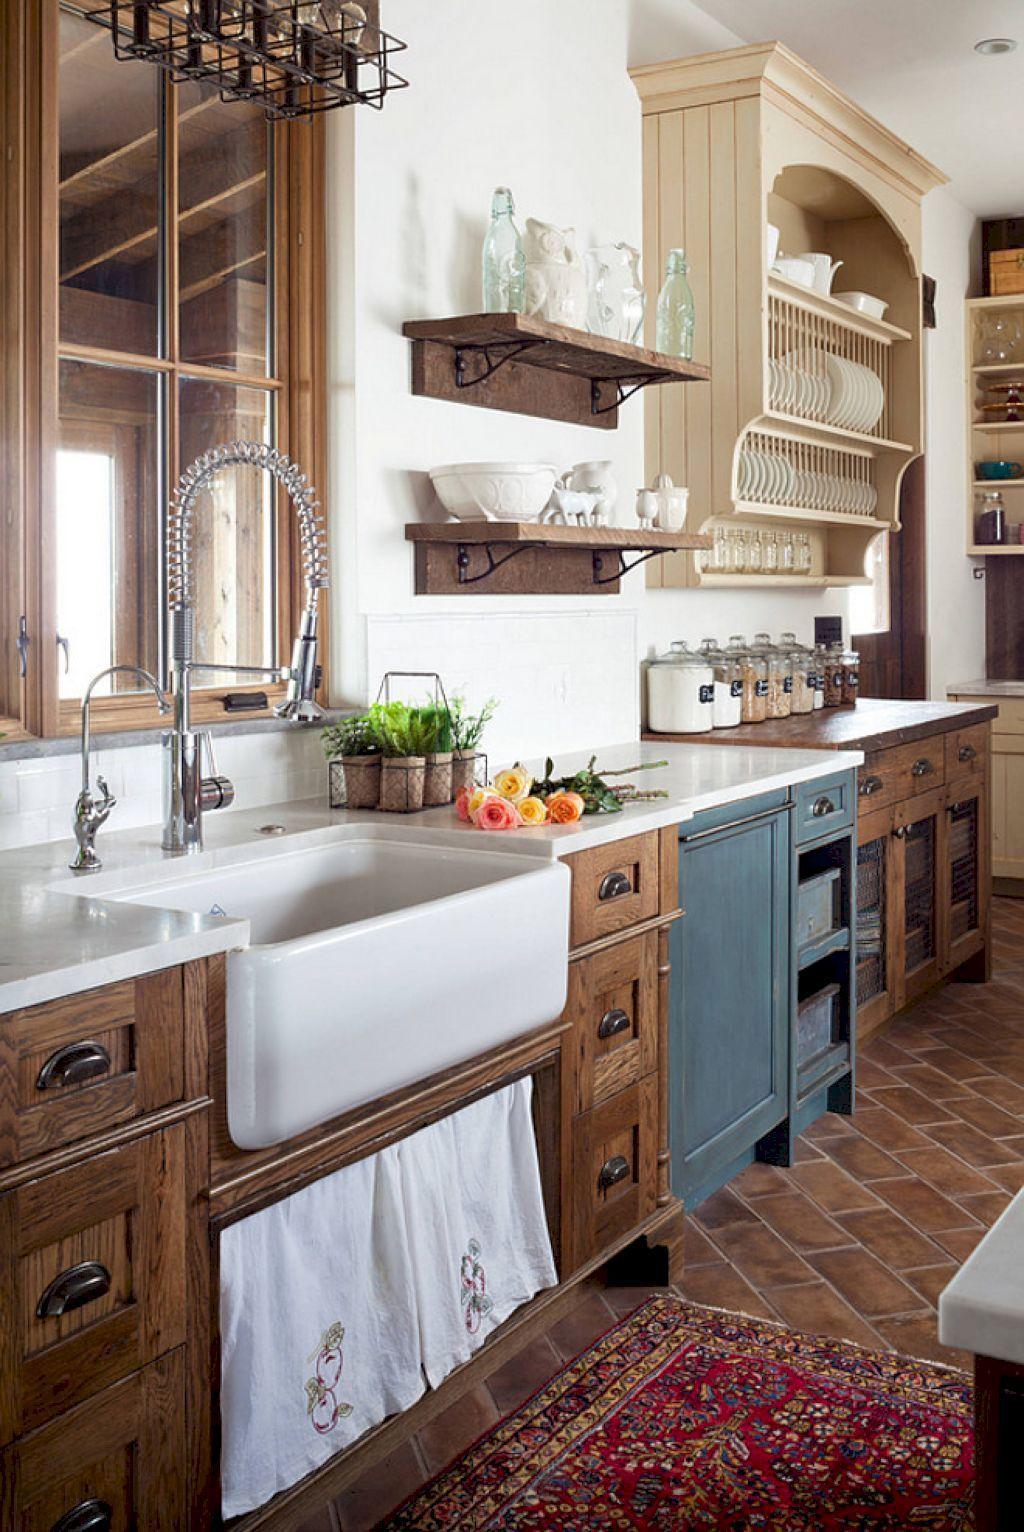 Farmhouse kitchen ideas (23 | Cocinas de cabañas, Ideas cocinas y ...